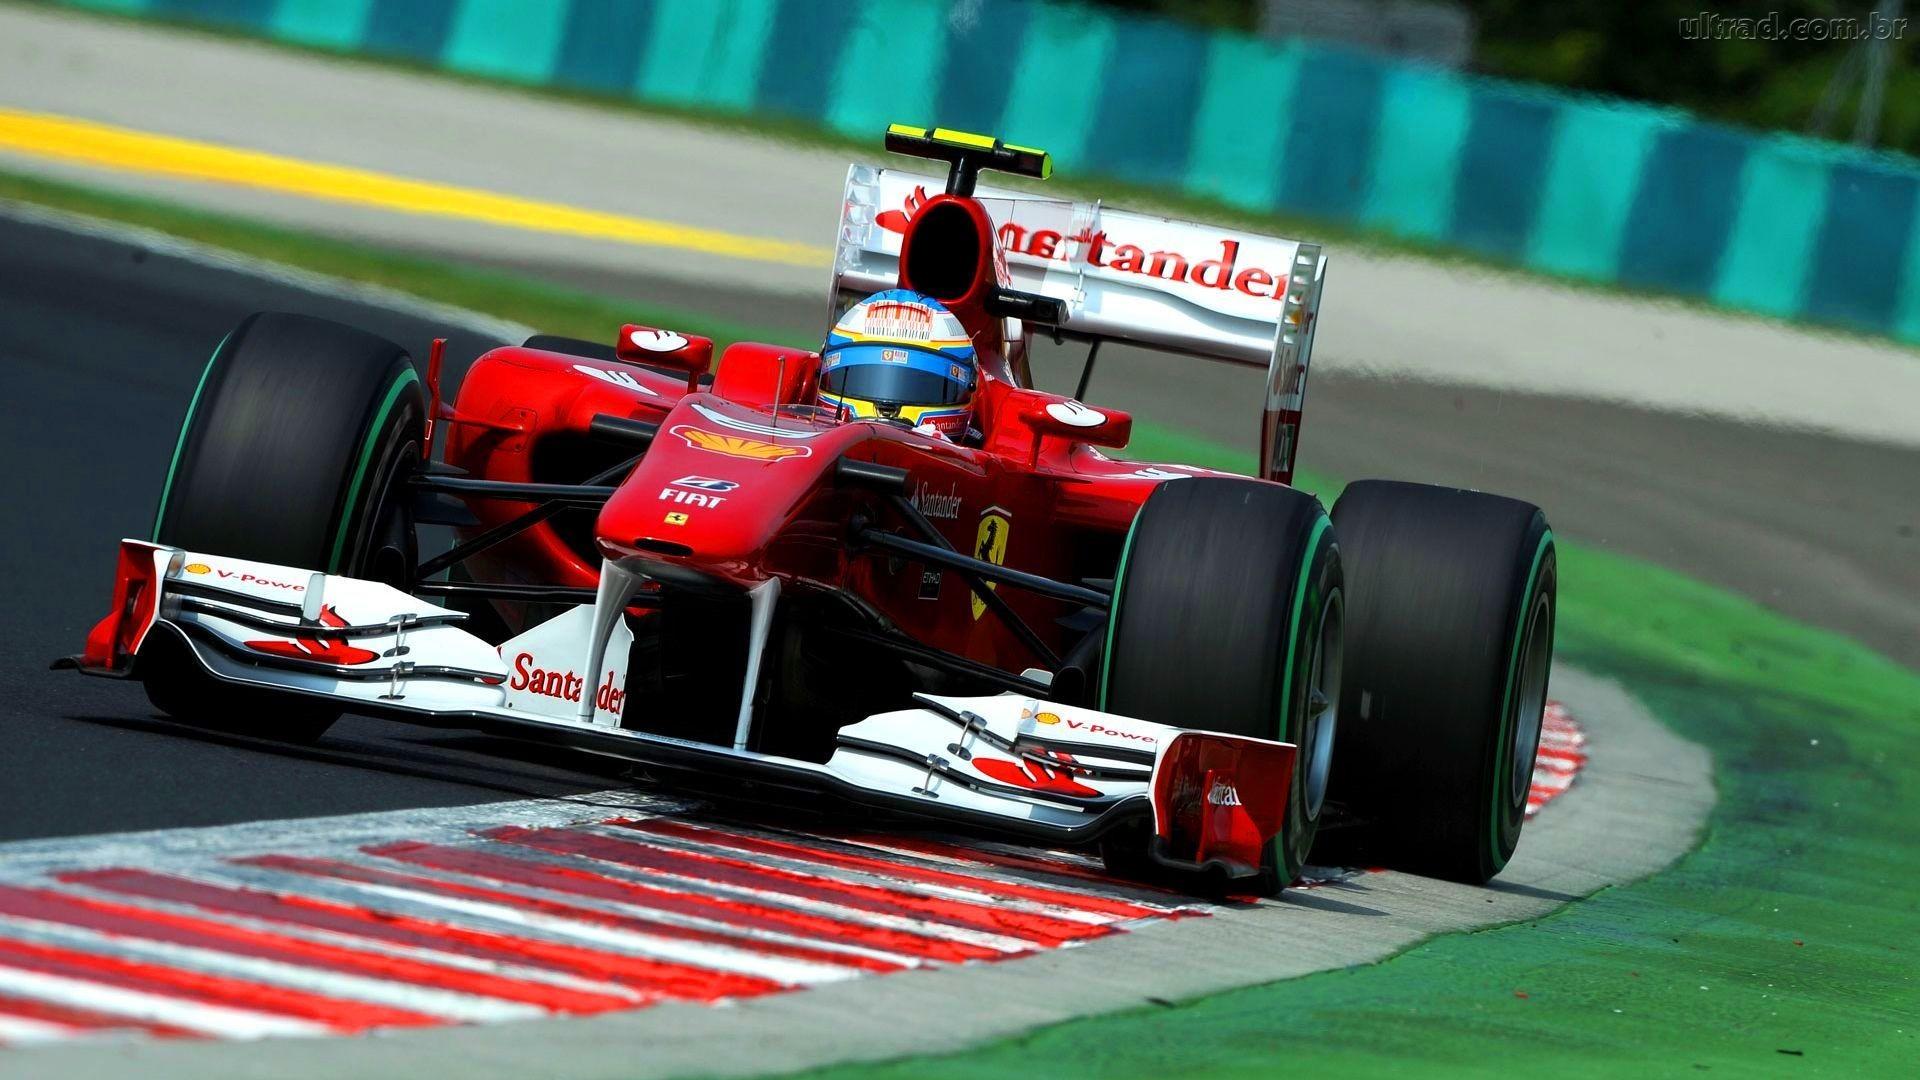 Wallpaper 1920x1080 Px Fernando Alonso Ferrari 1920x1080